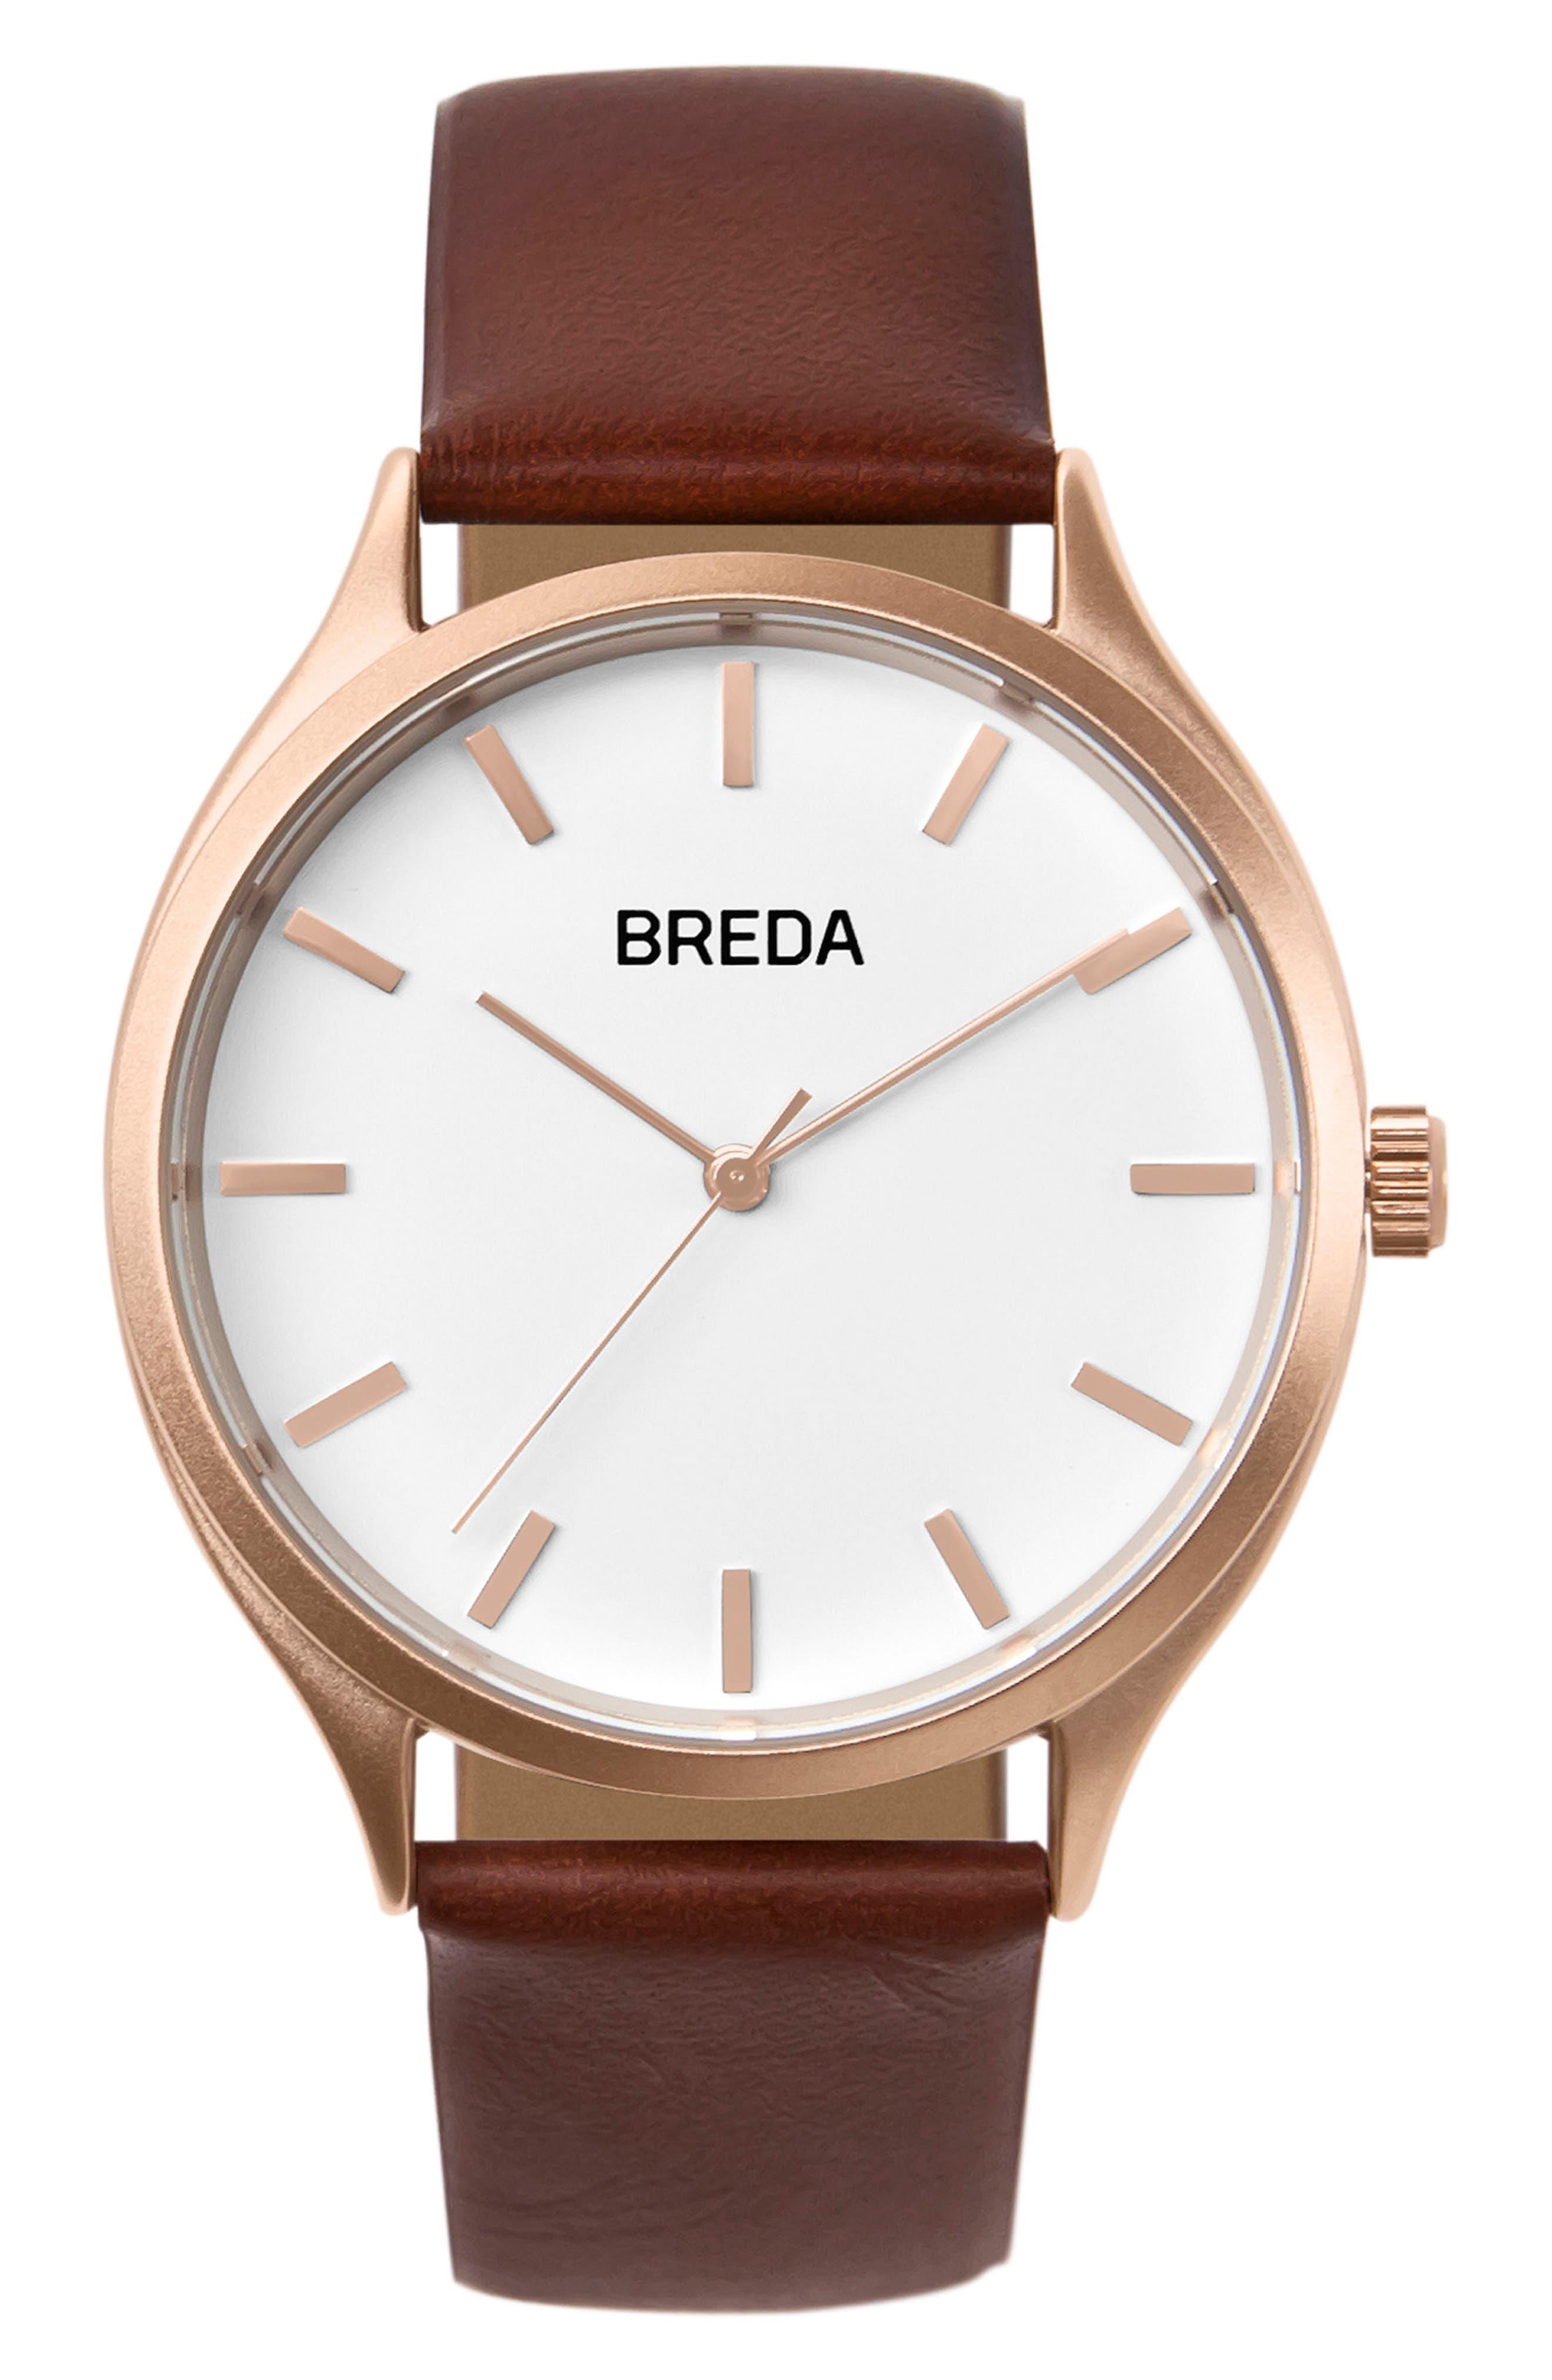 Main Image - BREDA Asper Round Leather Strap Watch, 40mm